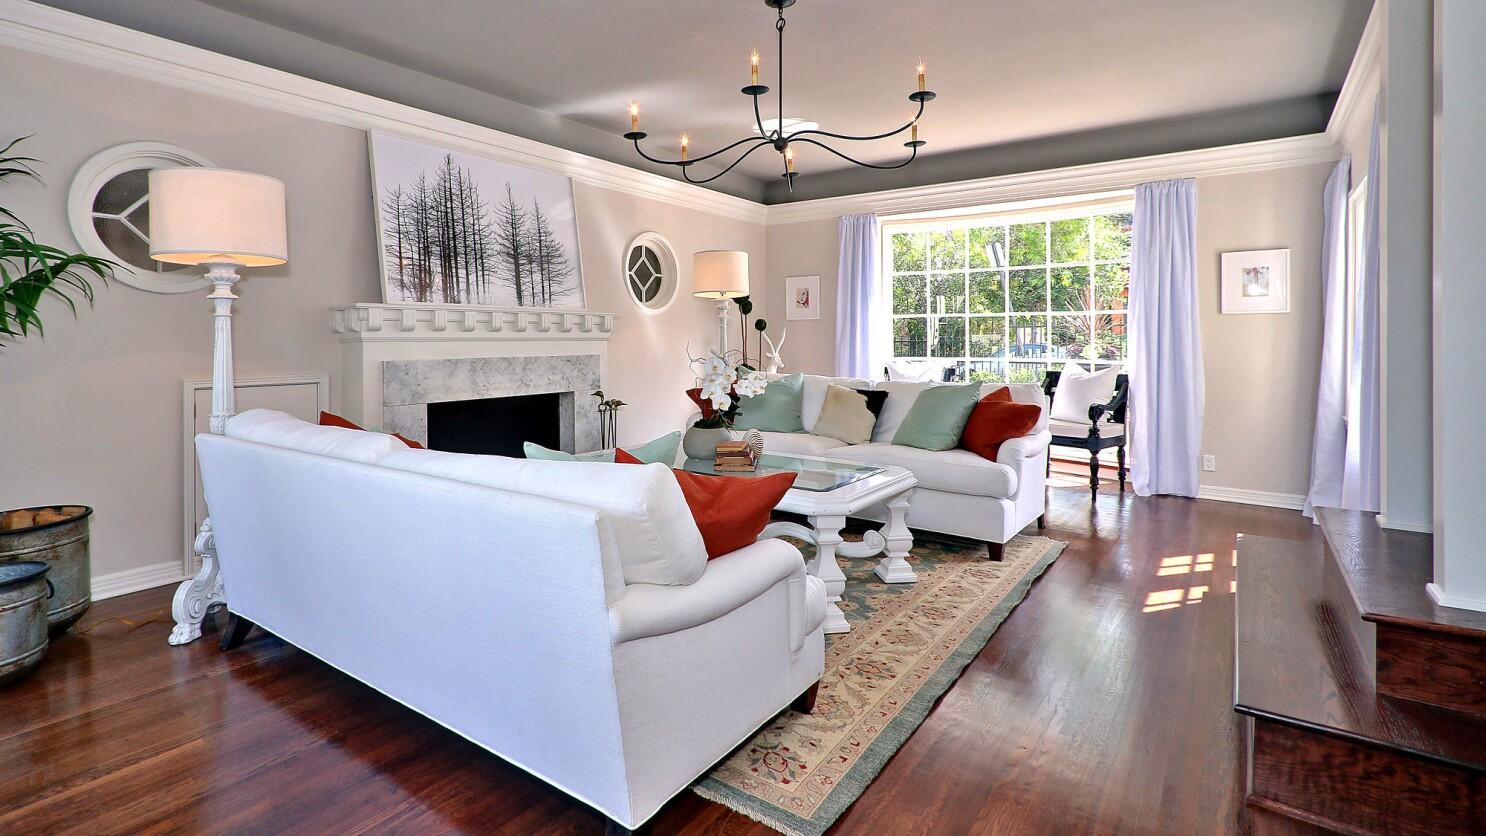 Home decor leaning toward many shades of gray   Los Angeles Times